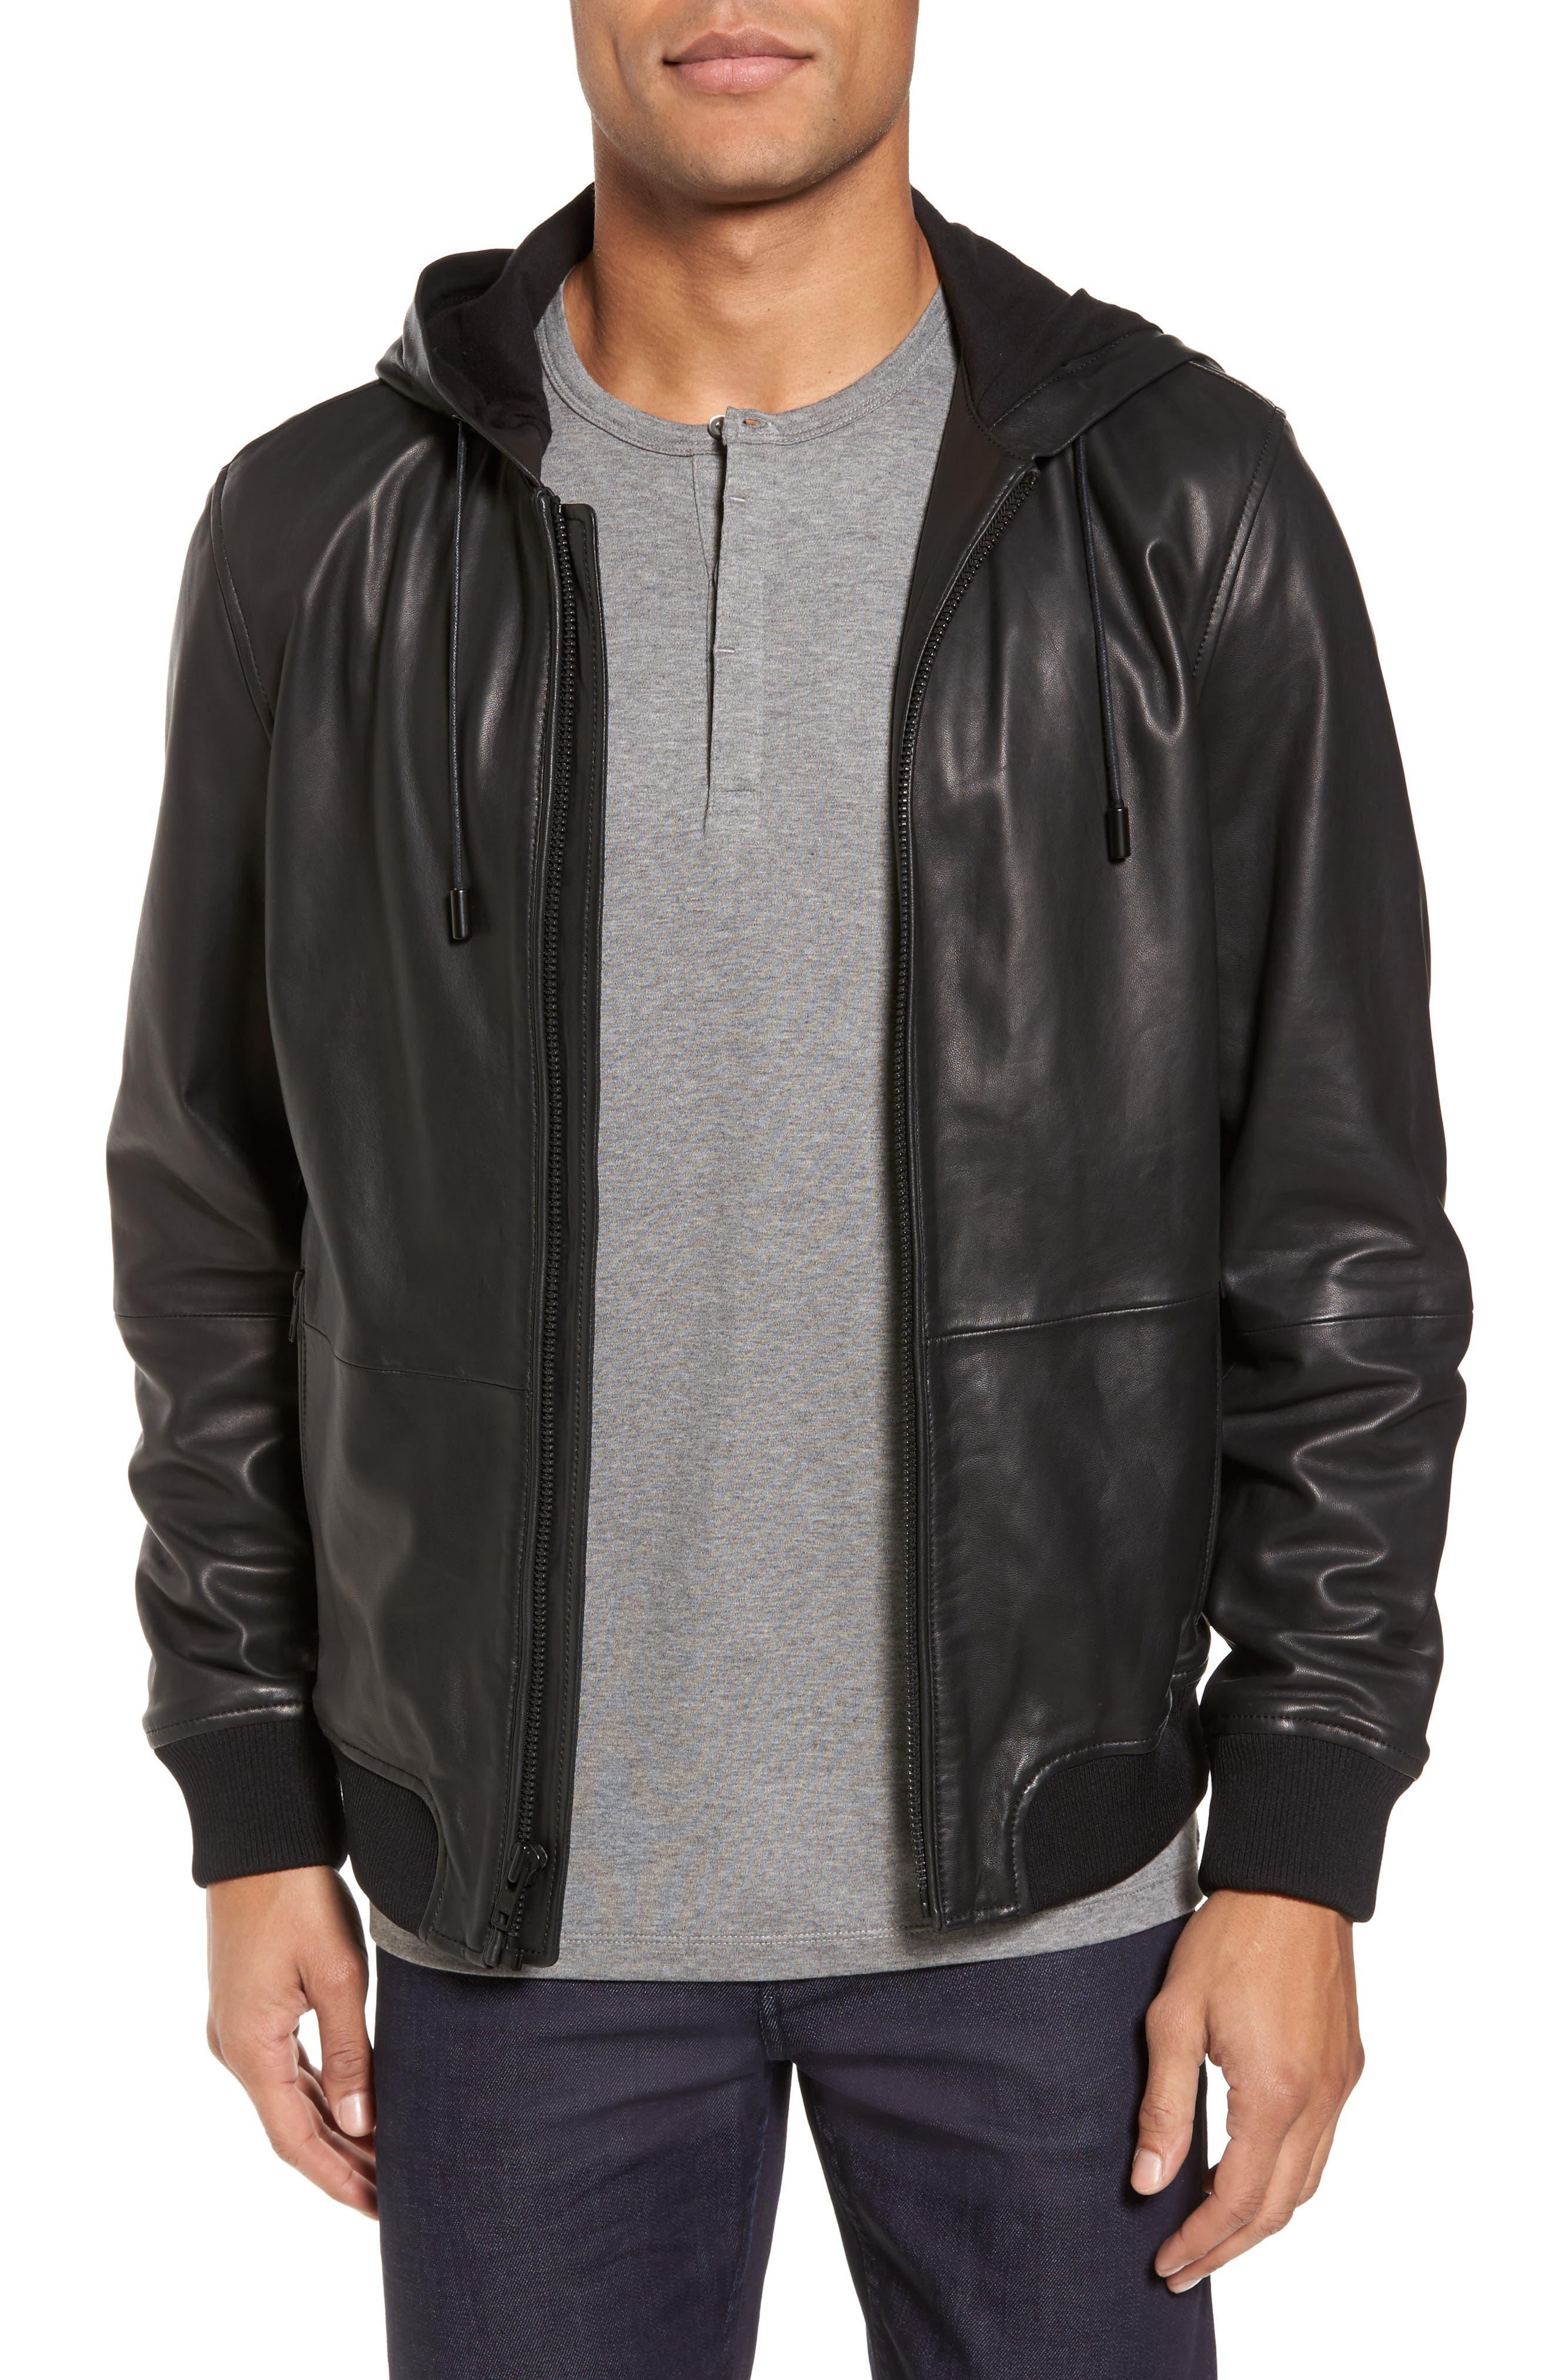 Hooded Leather Jacket,                             Main thumbnail 1, color,                             Black